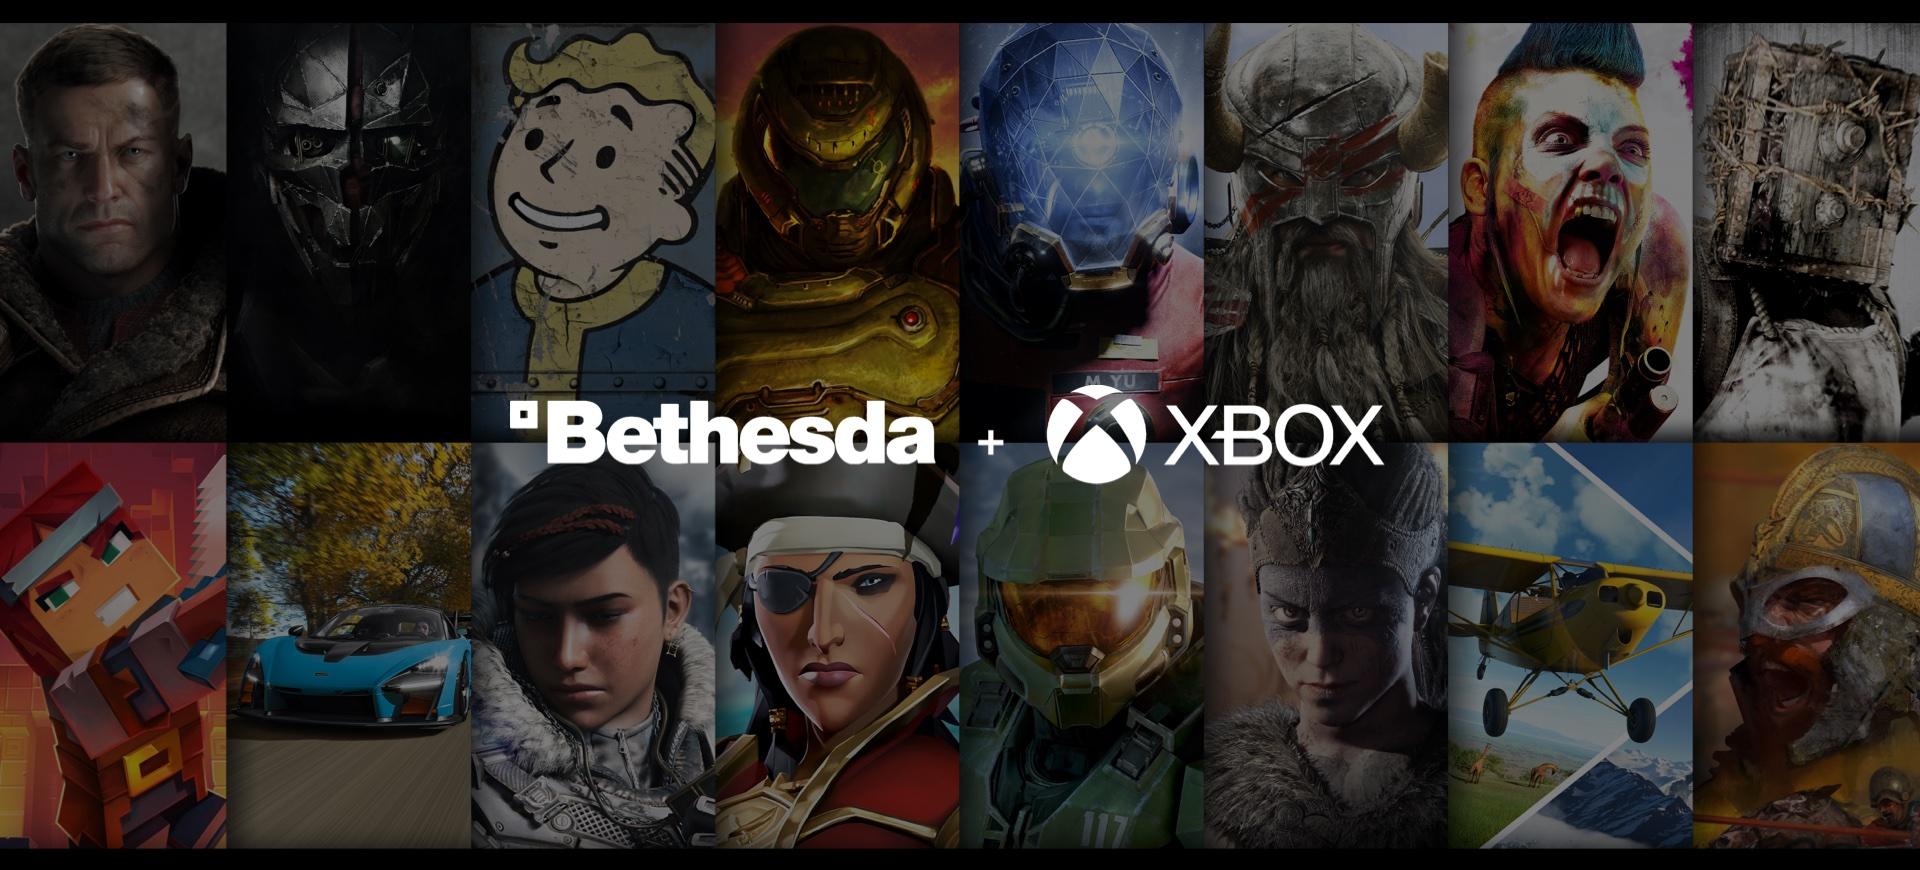 future Bethesda games